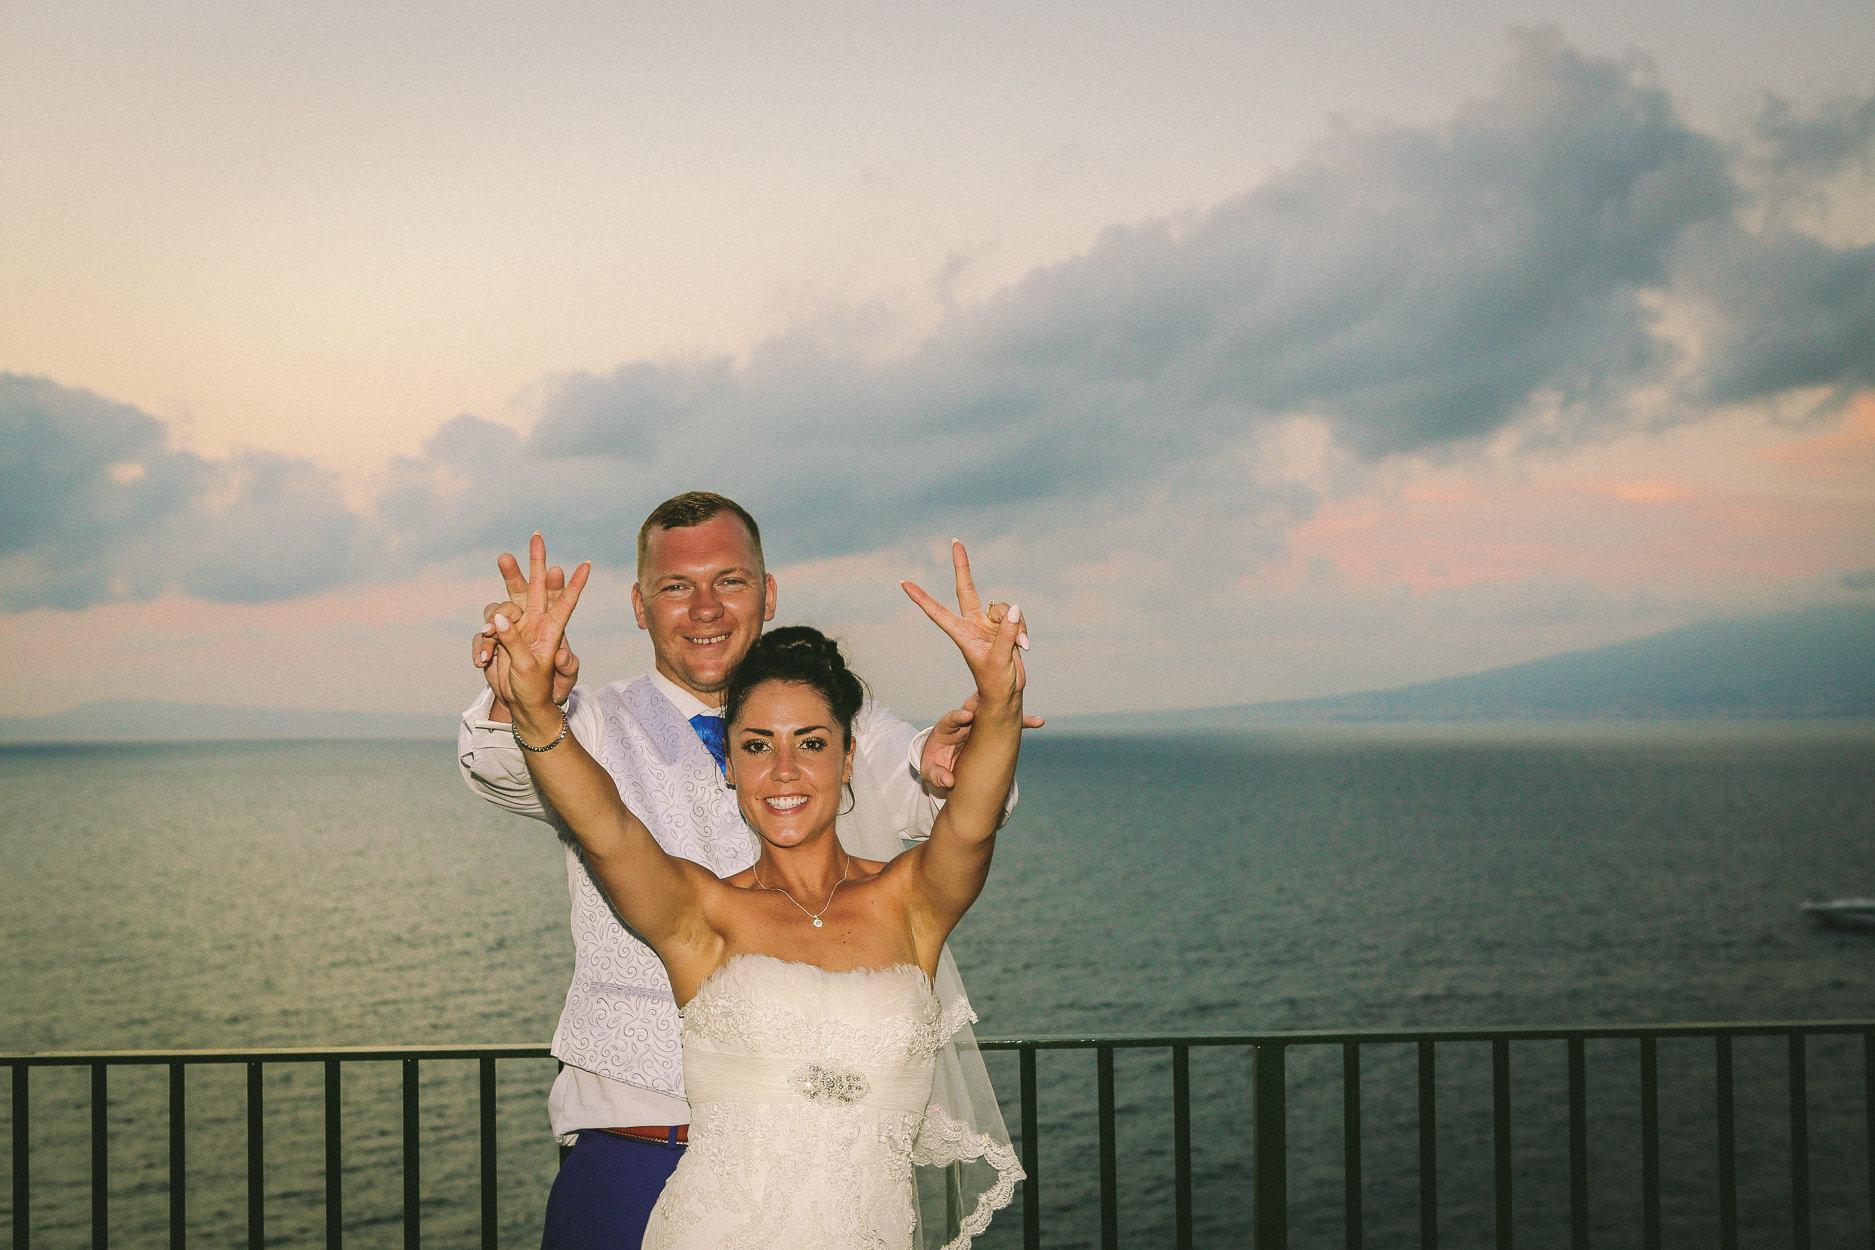 Amalfi-Coast-wedding-venue-Wedding-Photography-Villa Antiche Mura-Sorrento-Italy-31